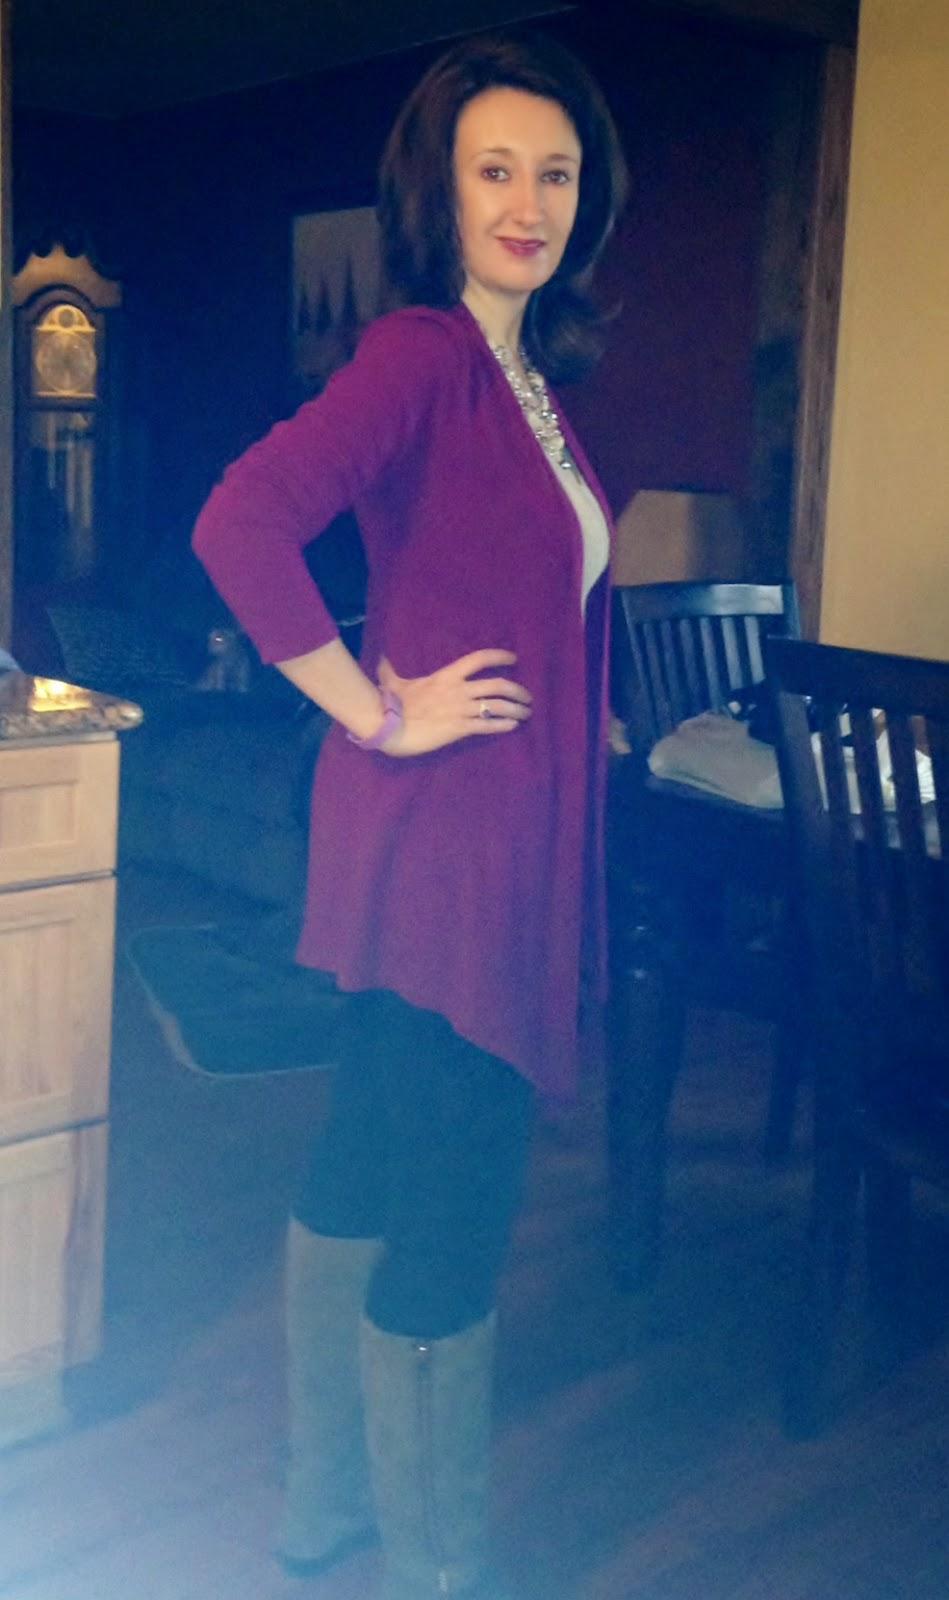 stitch fix, stylist, clothes, beauty, winter, sweaters